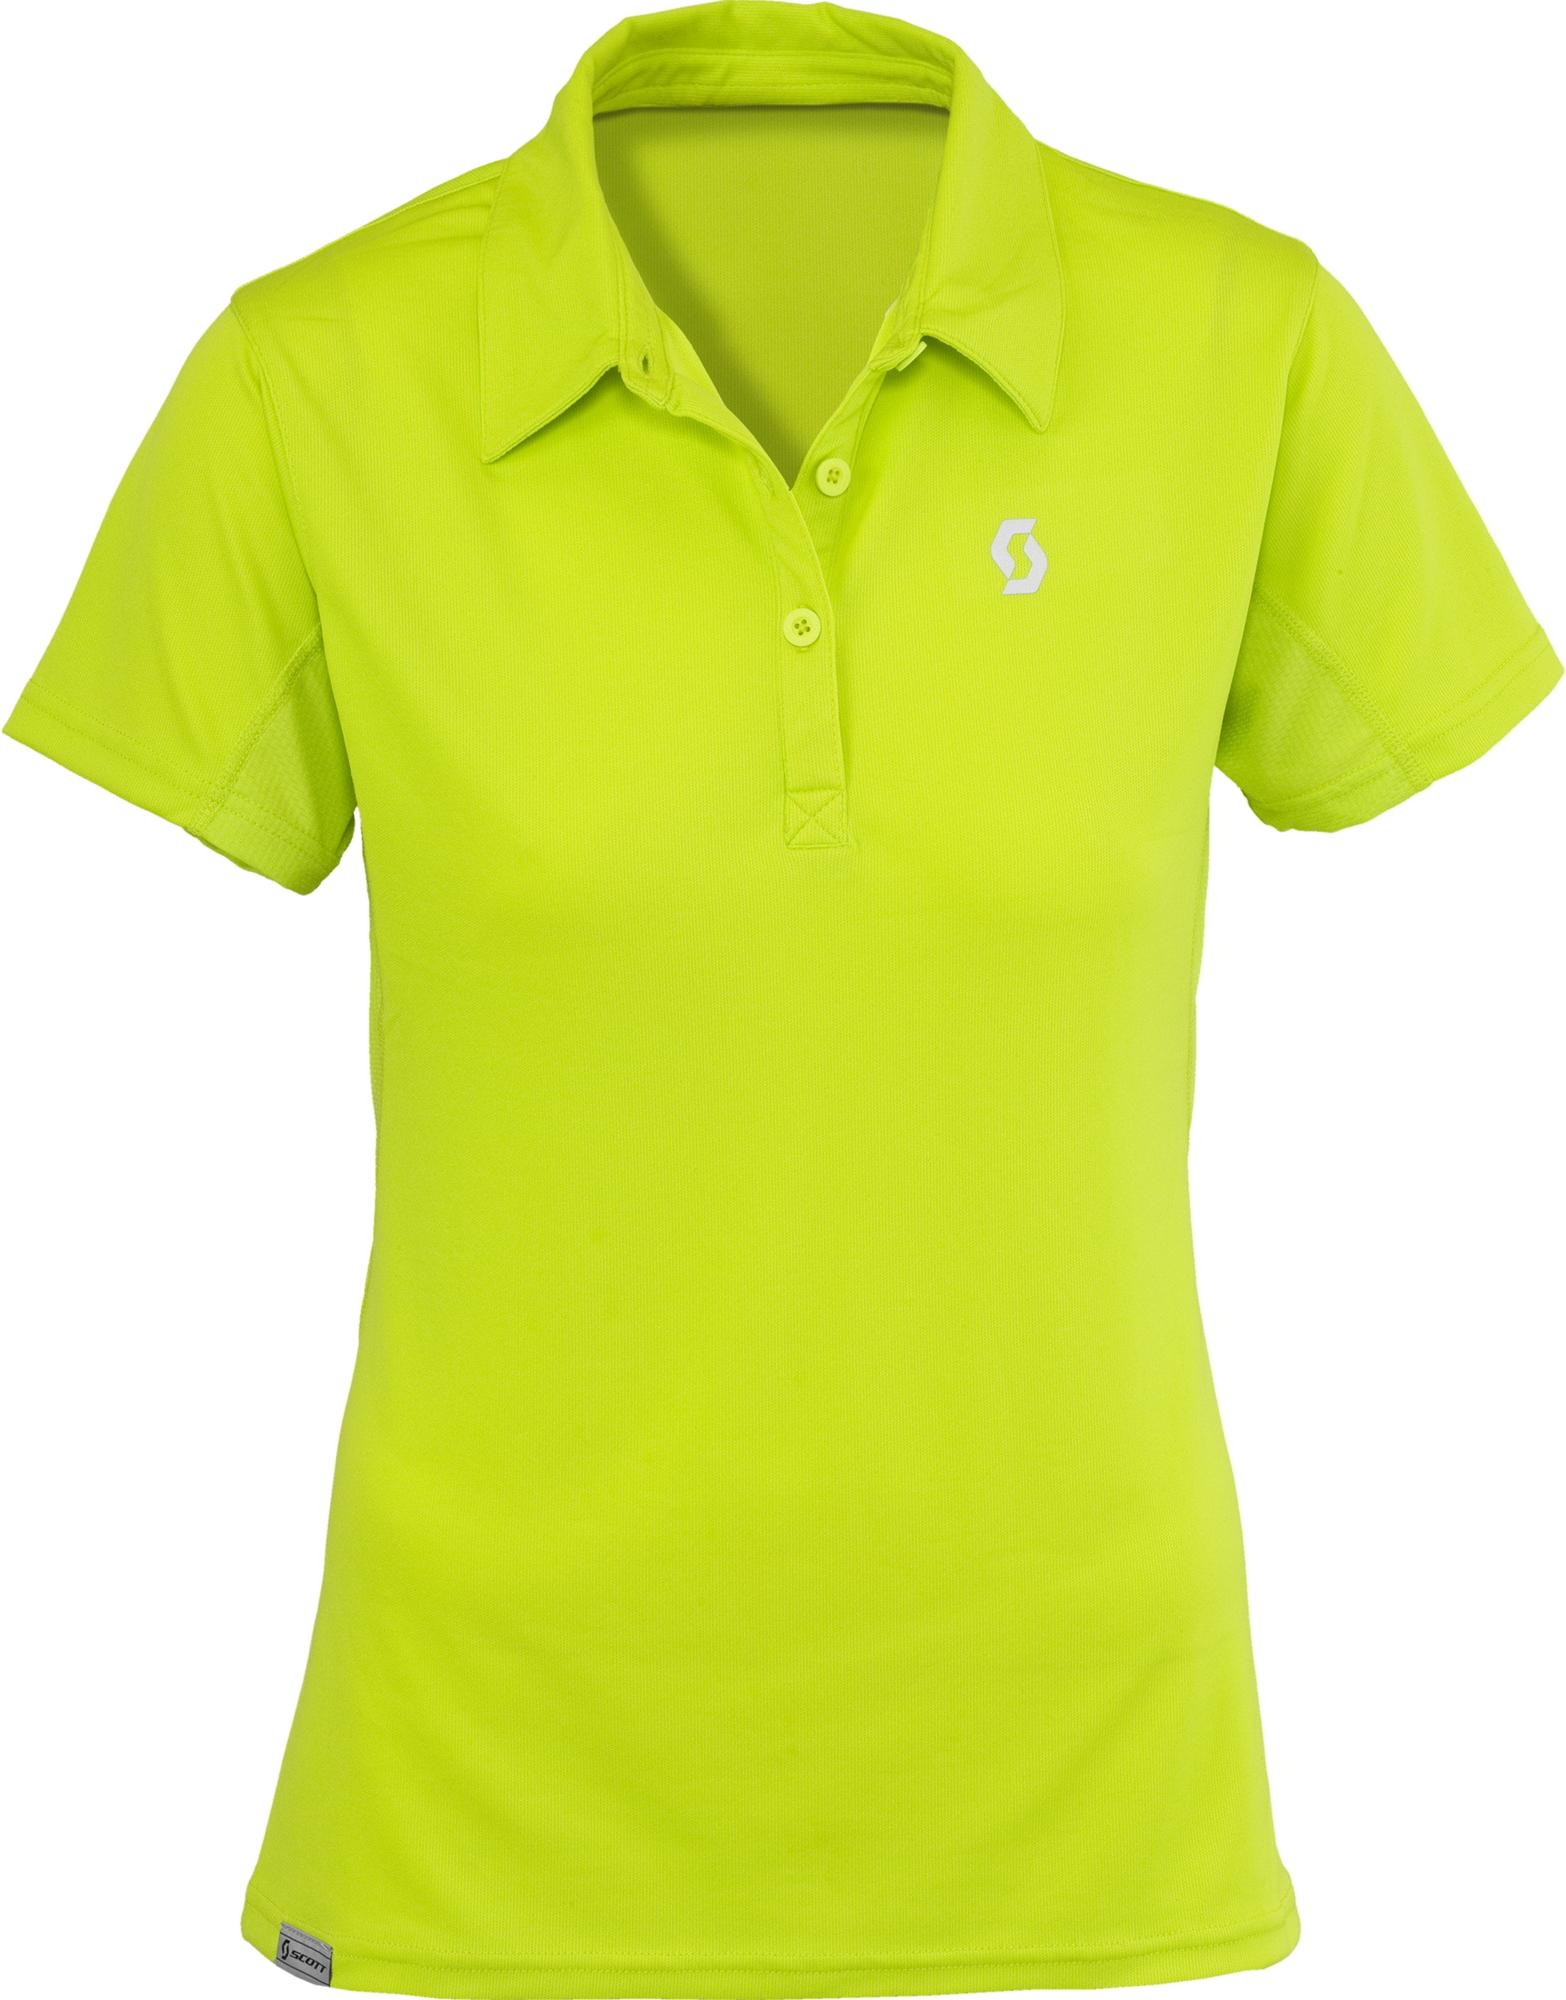 Green Polo Shirt Png Image Green Polo Shirts Shirts Polo Shirt